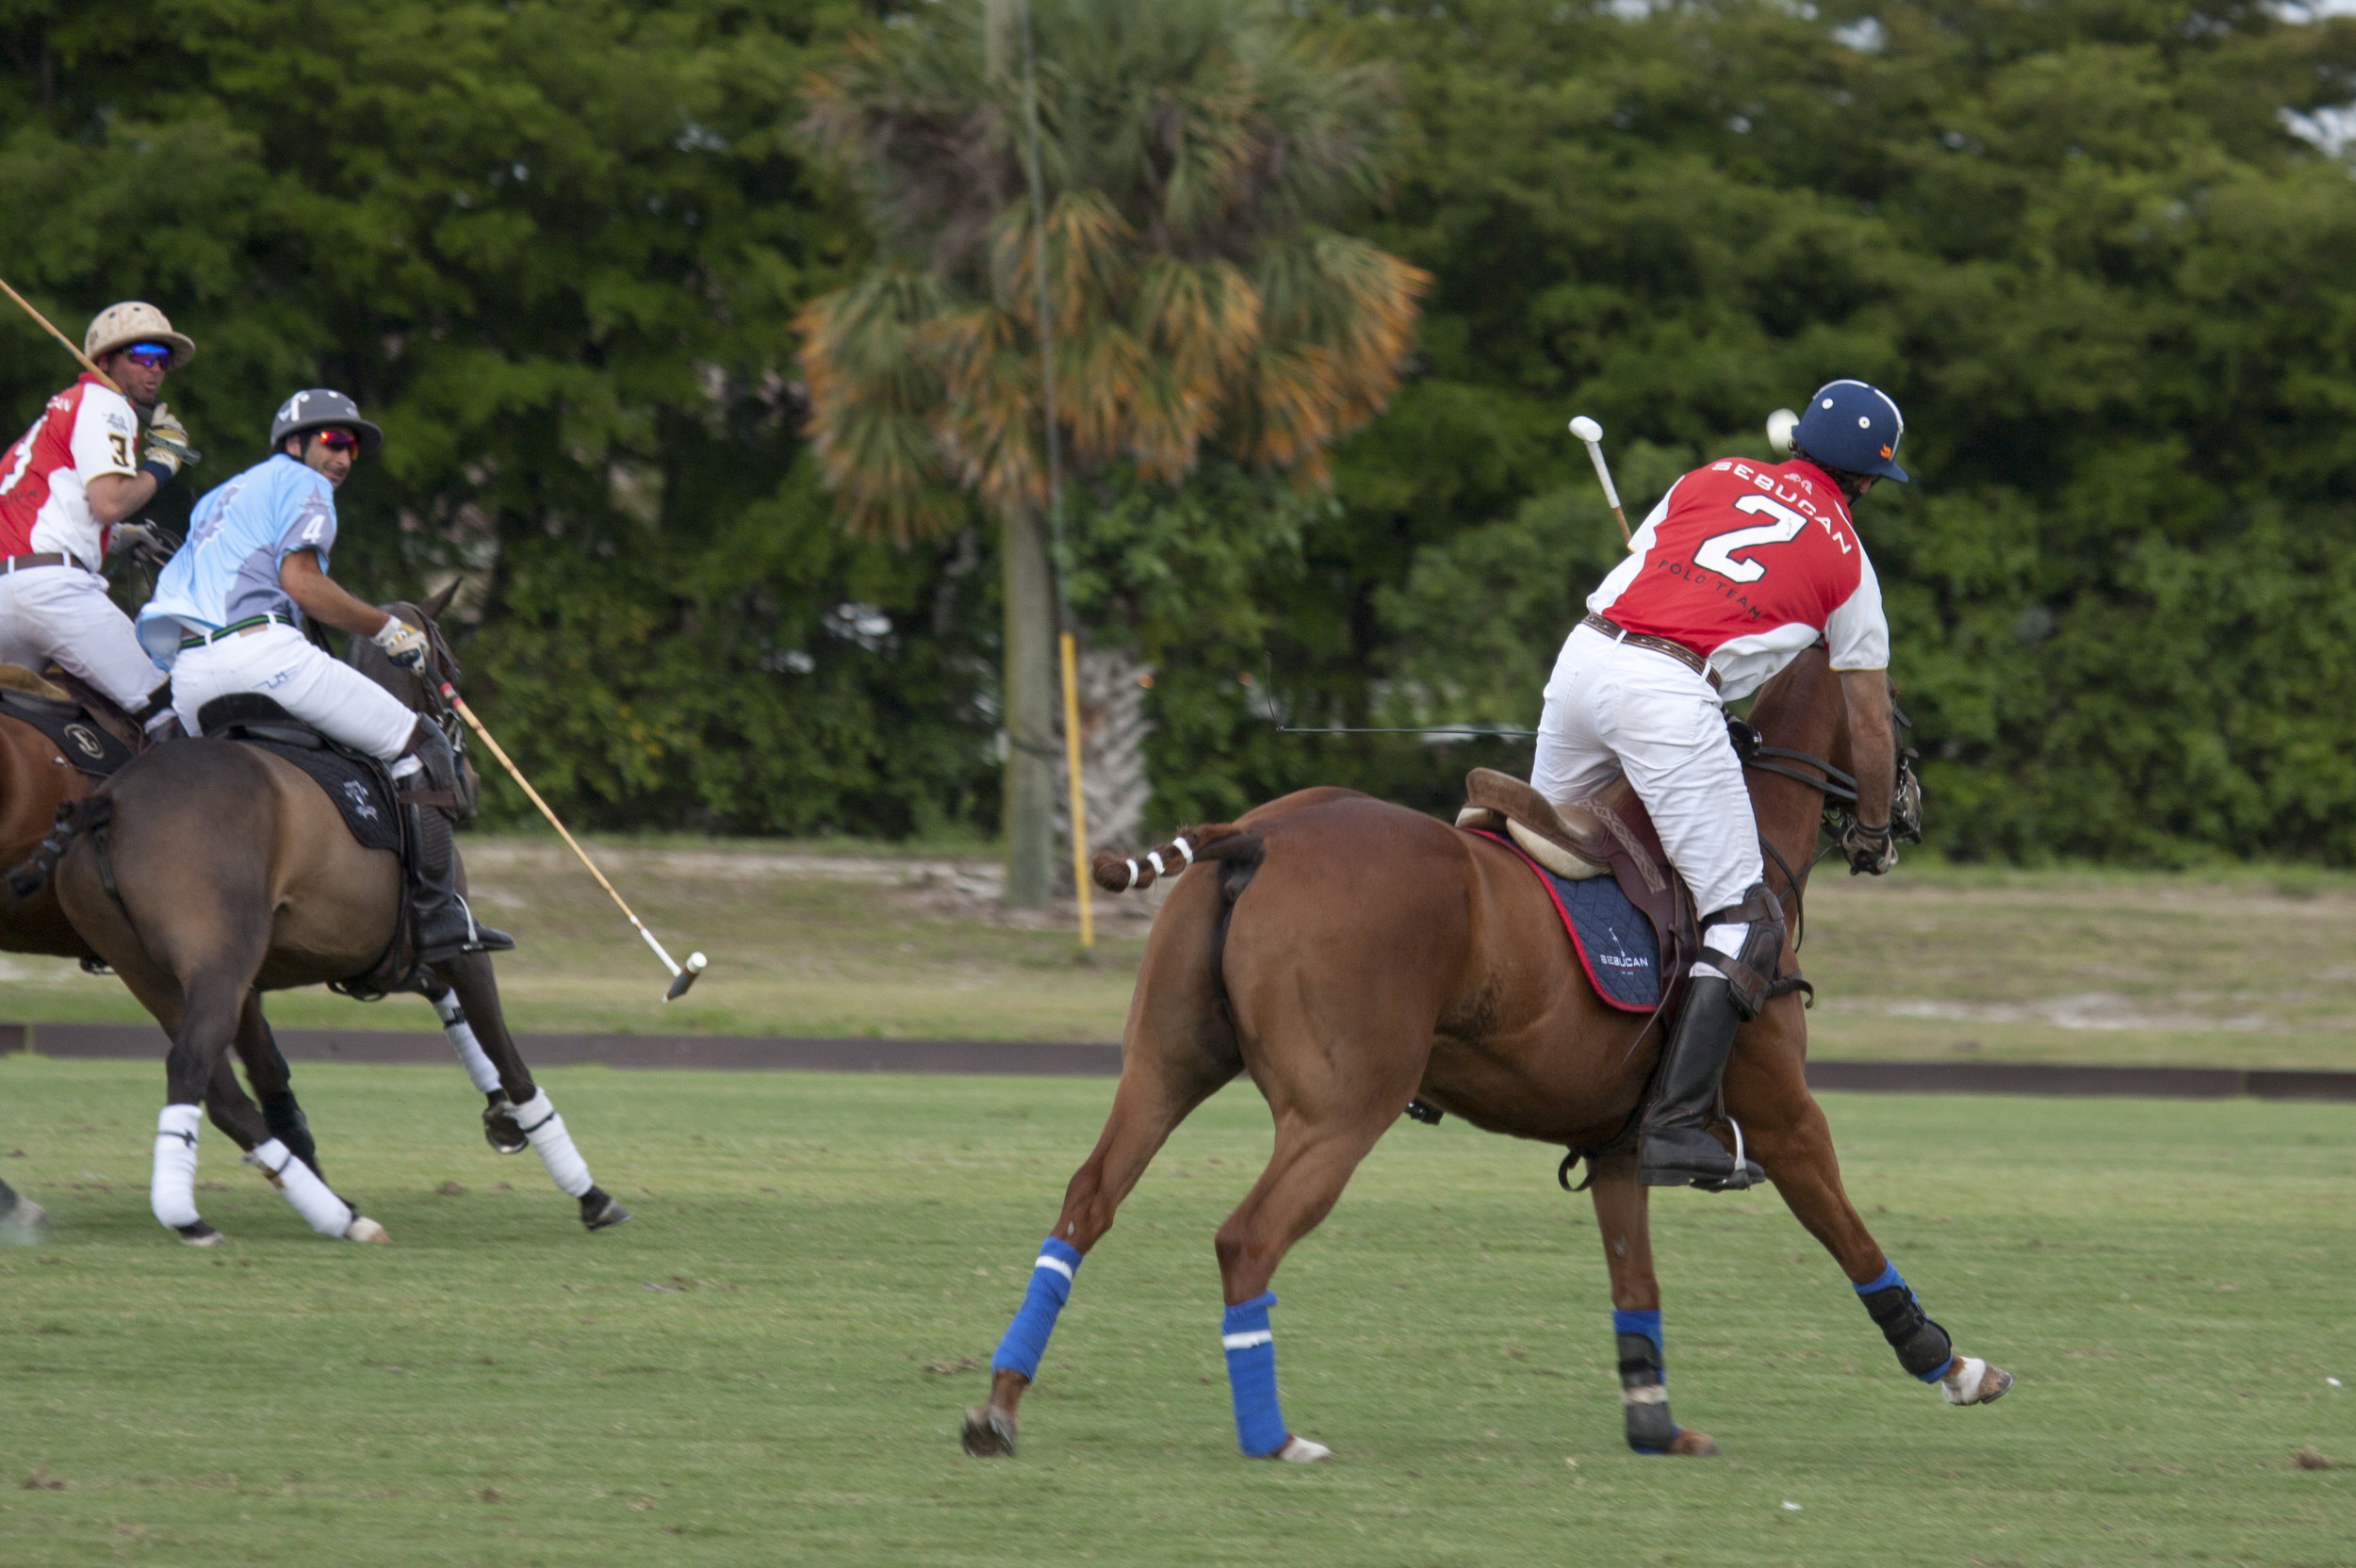 Pablo Pulido of Sebucan tries to hit a bac.JPG